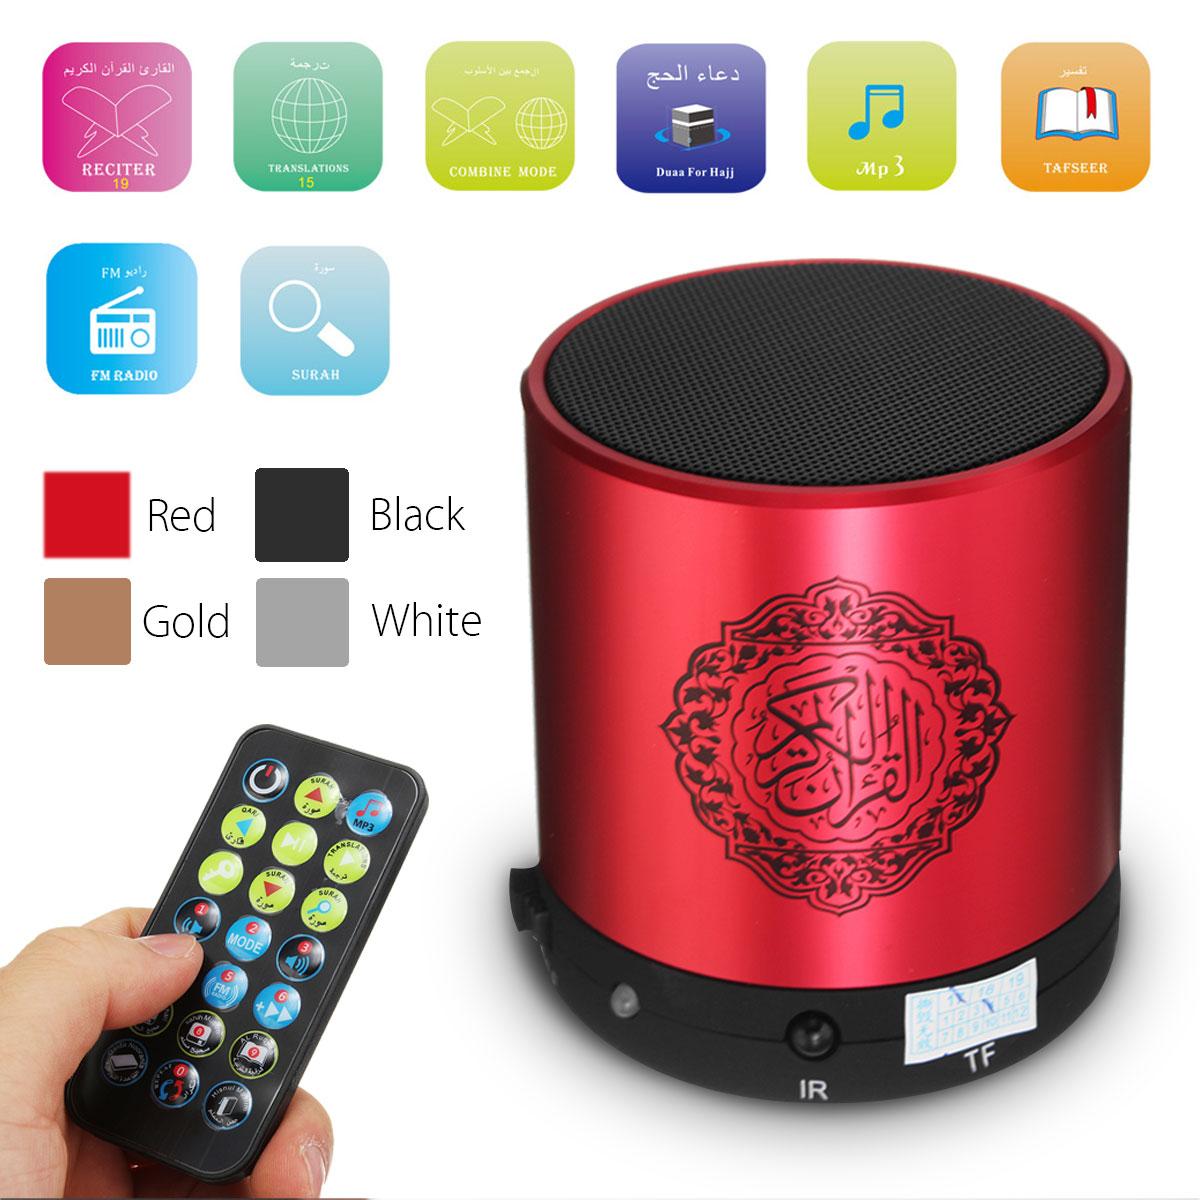 8GB TF FM Speaker Remote Control Speaker Quran Speaker MP3 Player Quran Koran Translator USB Rechargeable Speaker US